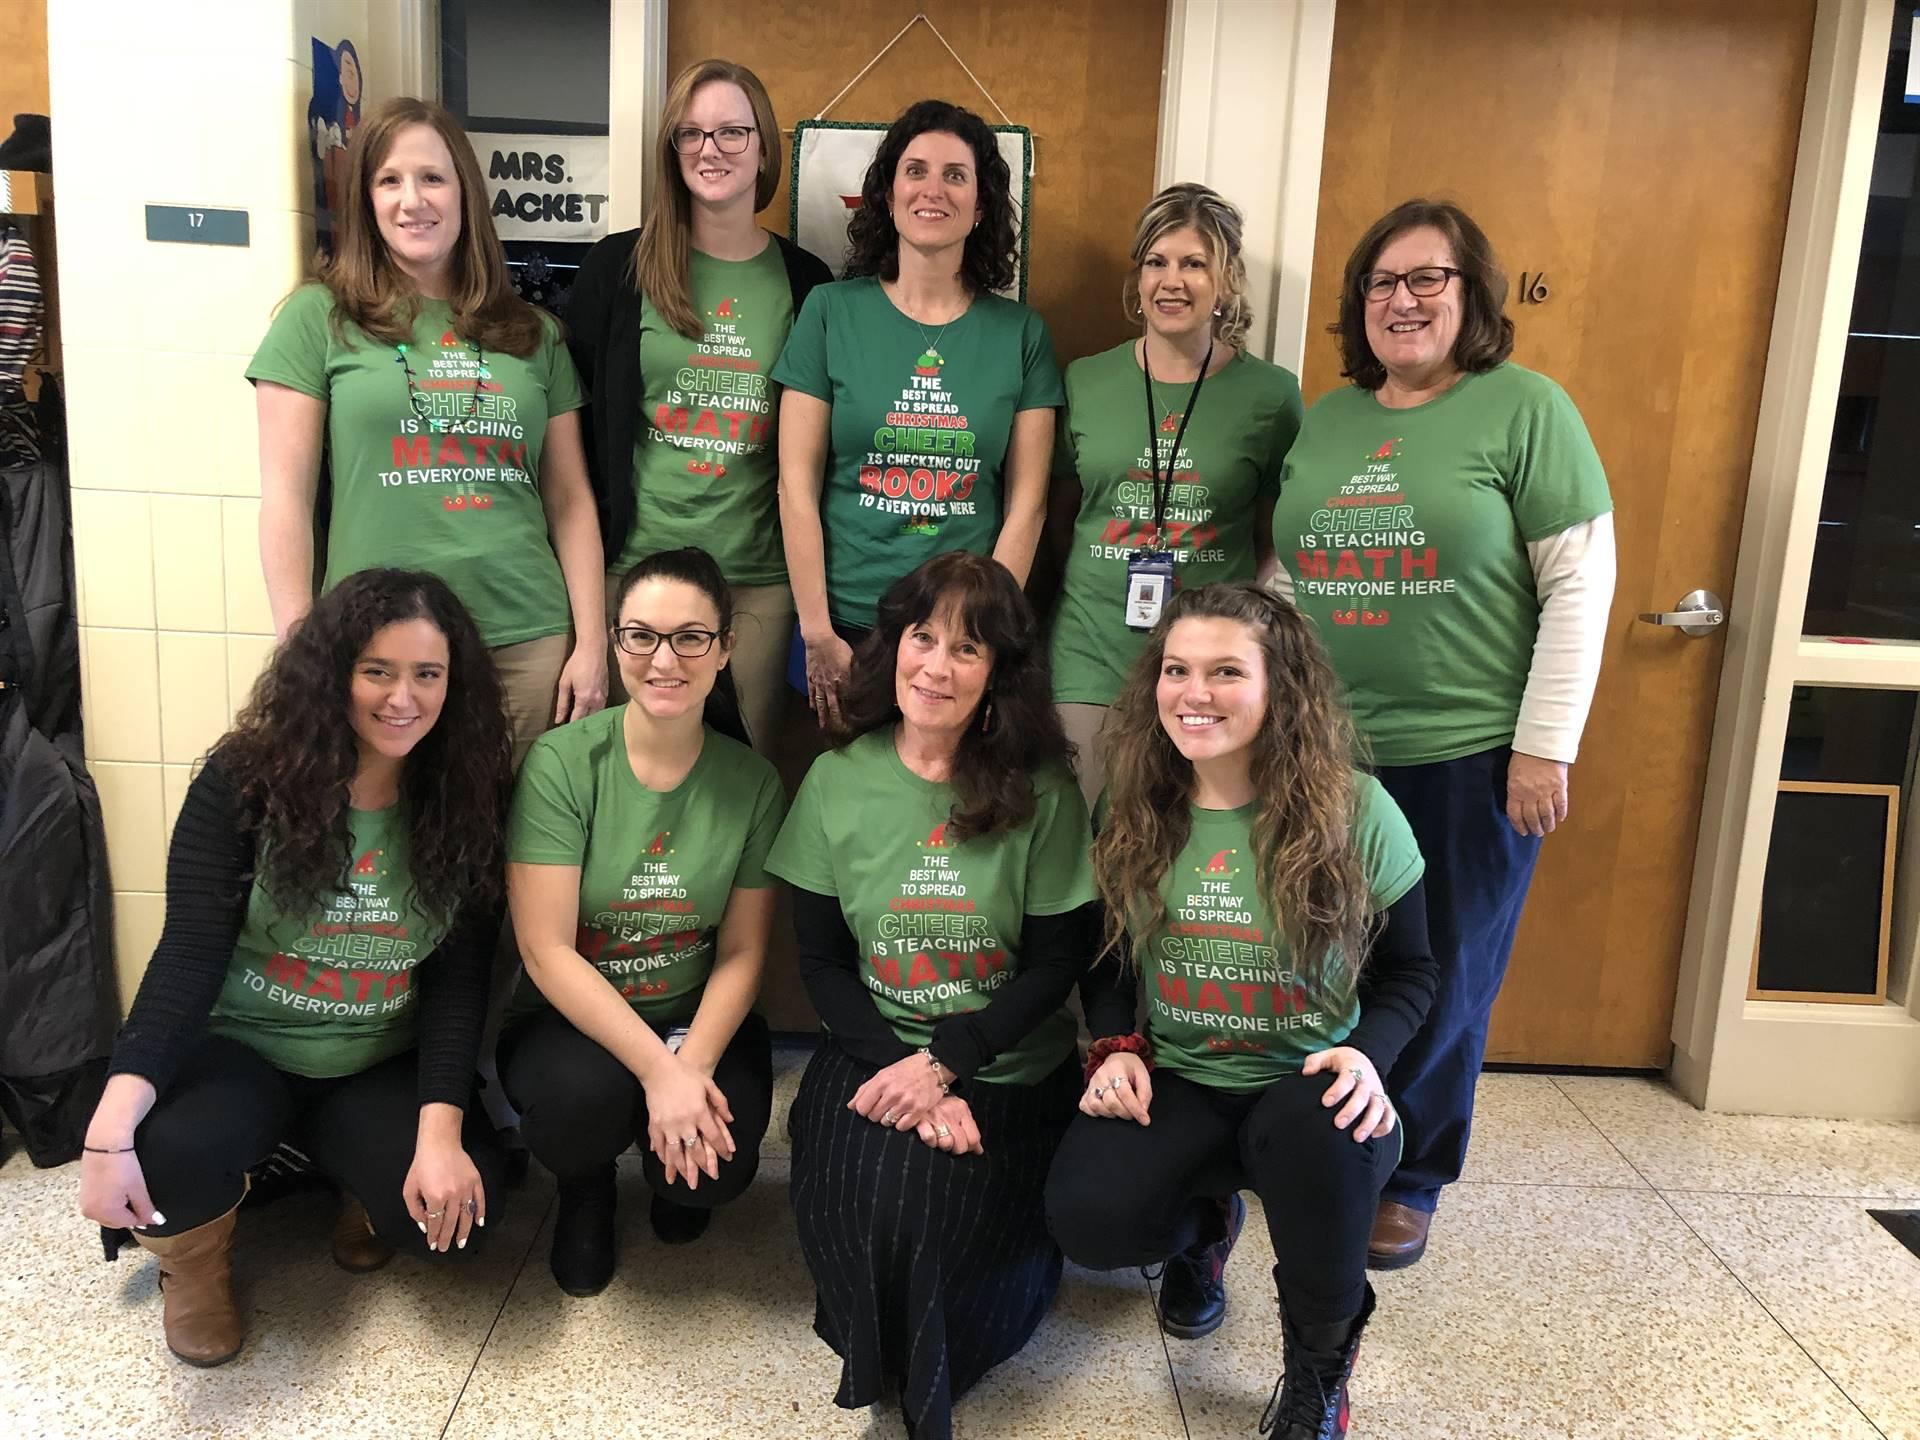 Teachers wearing matching green holiday shirts